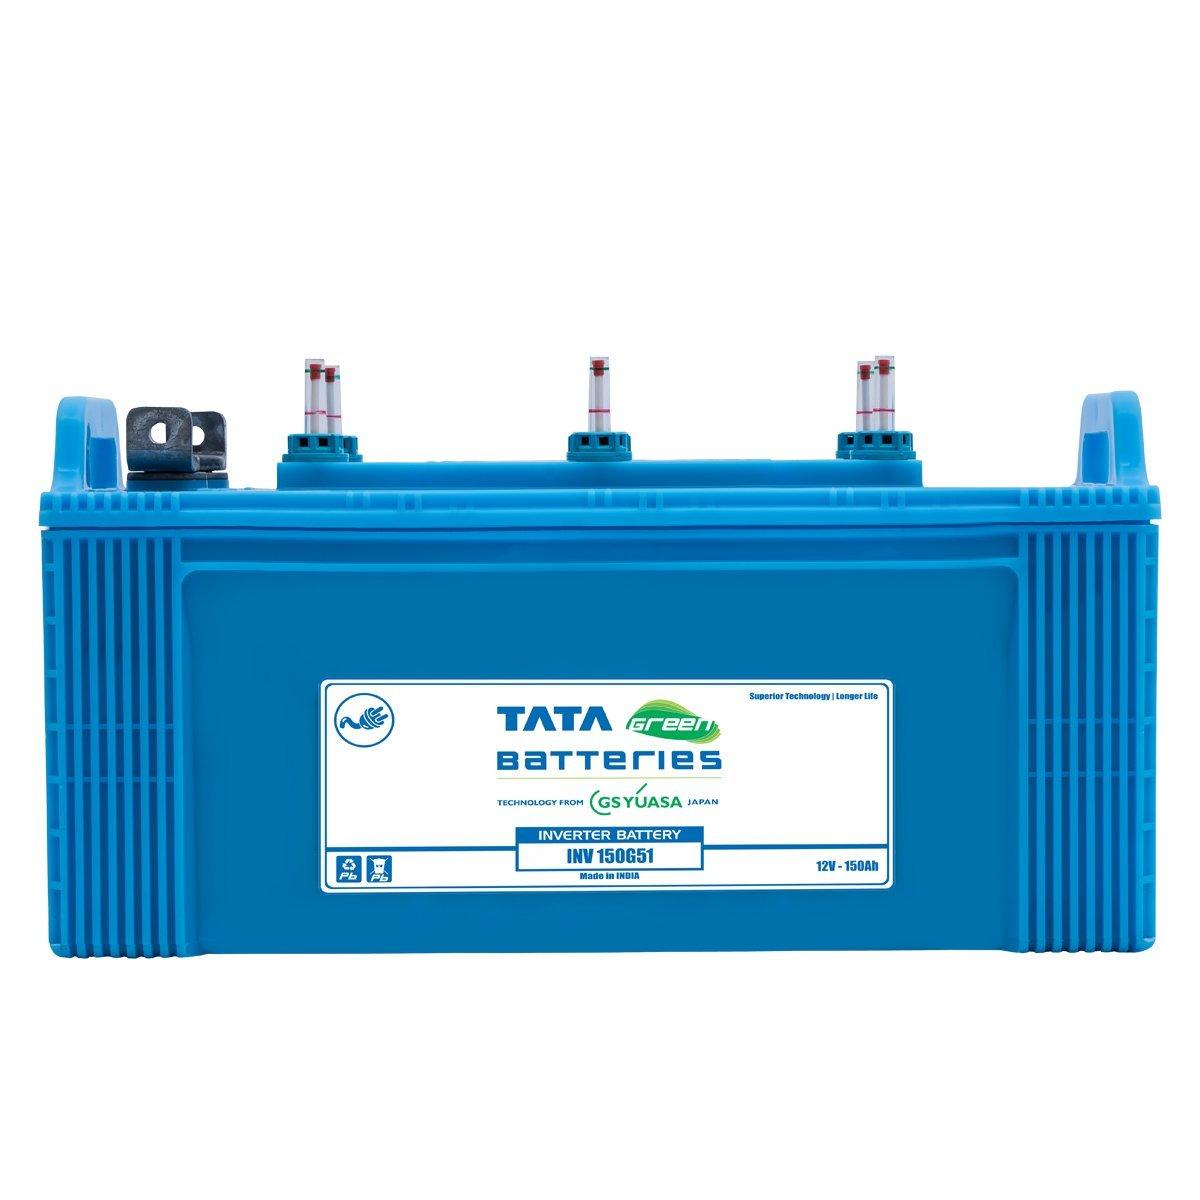 Tata Green Batteries 1419511186 INV-150G51 12V 150Ah